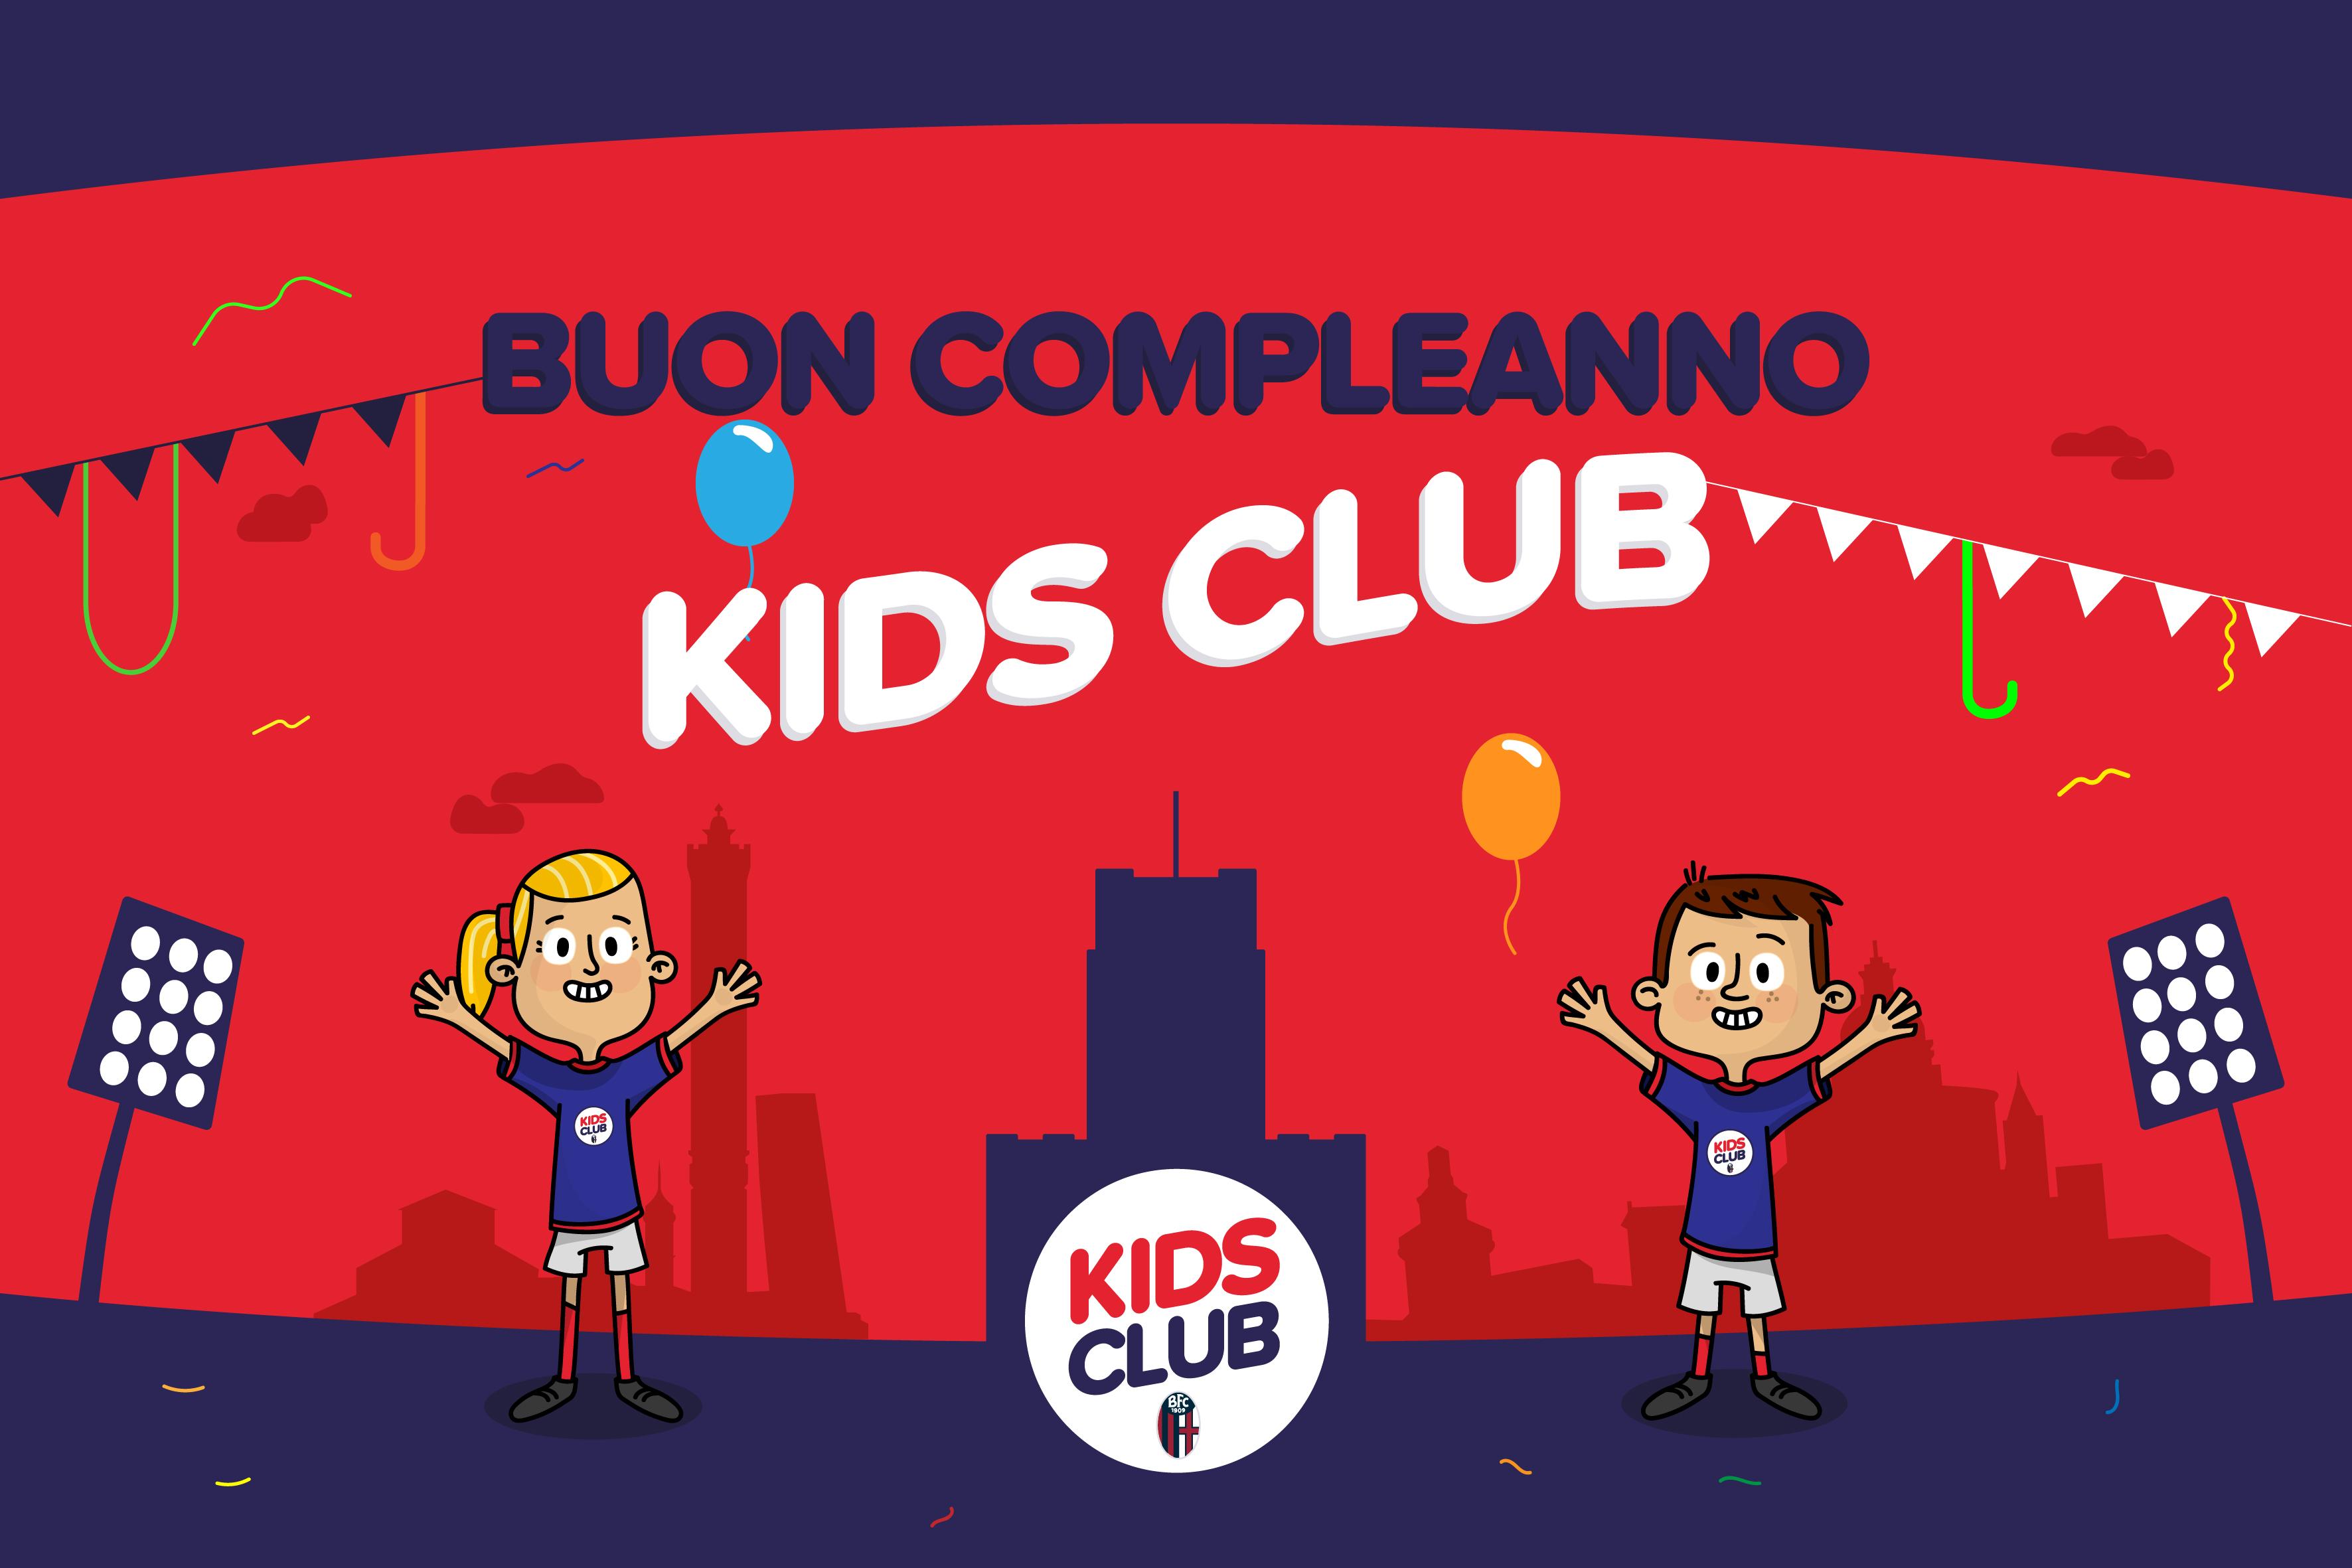 Buon Compleanno Kids Club Kids Club